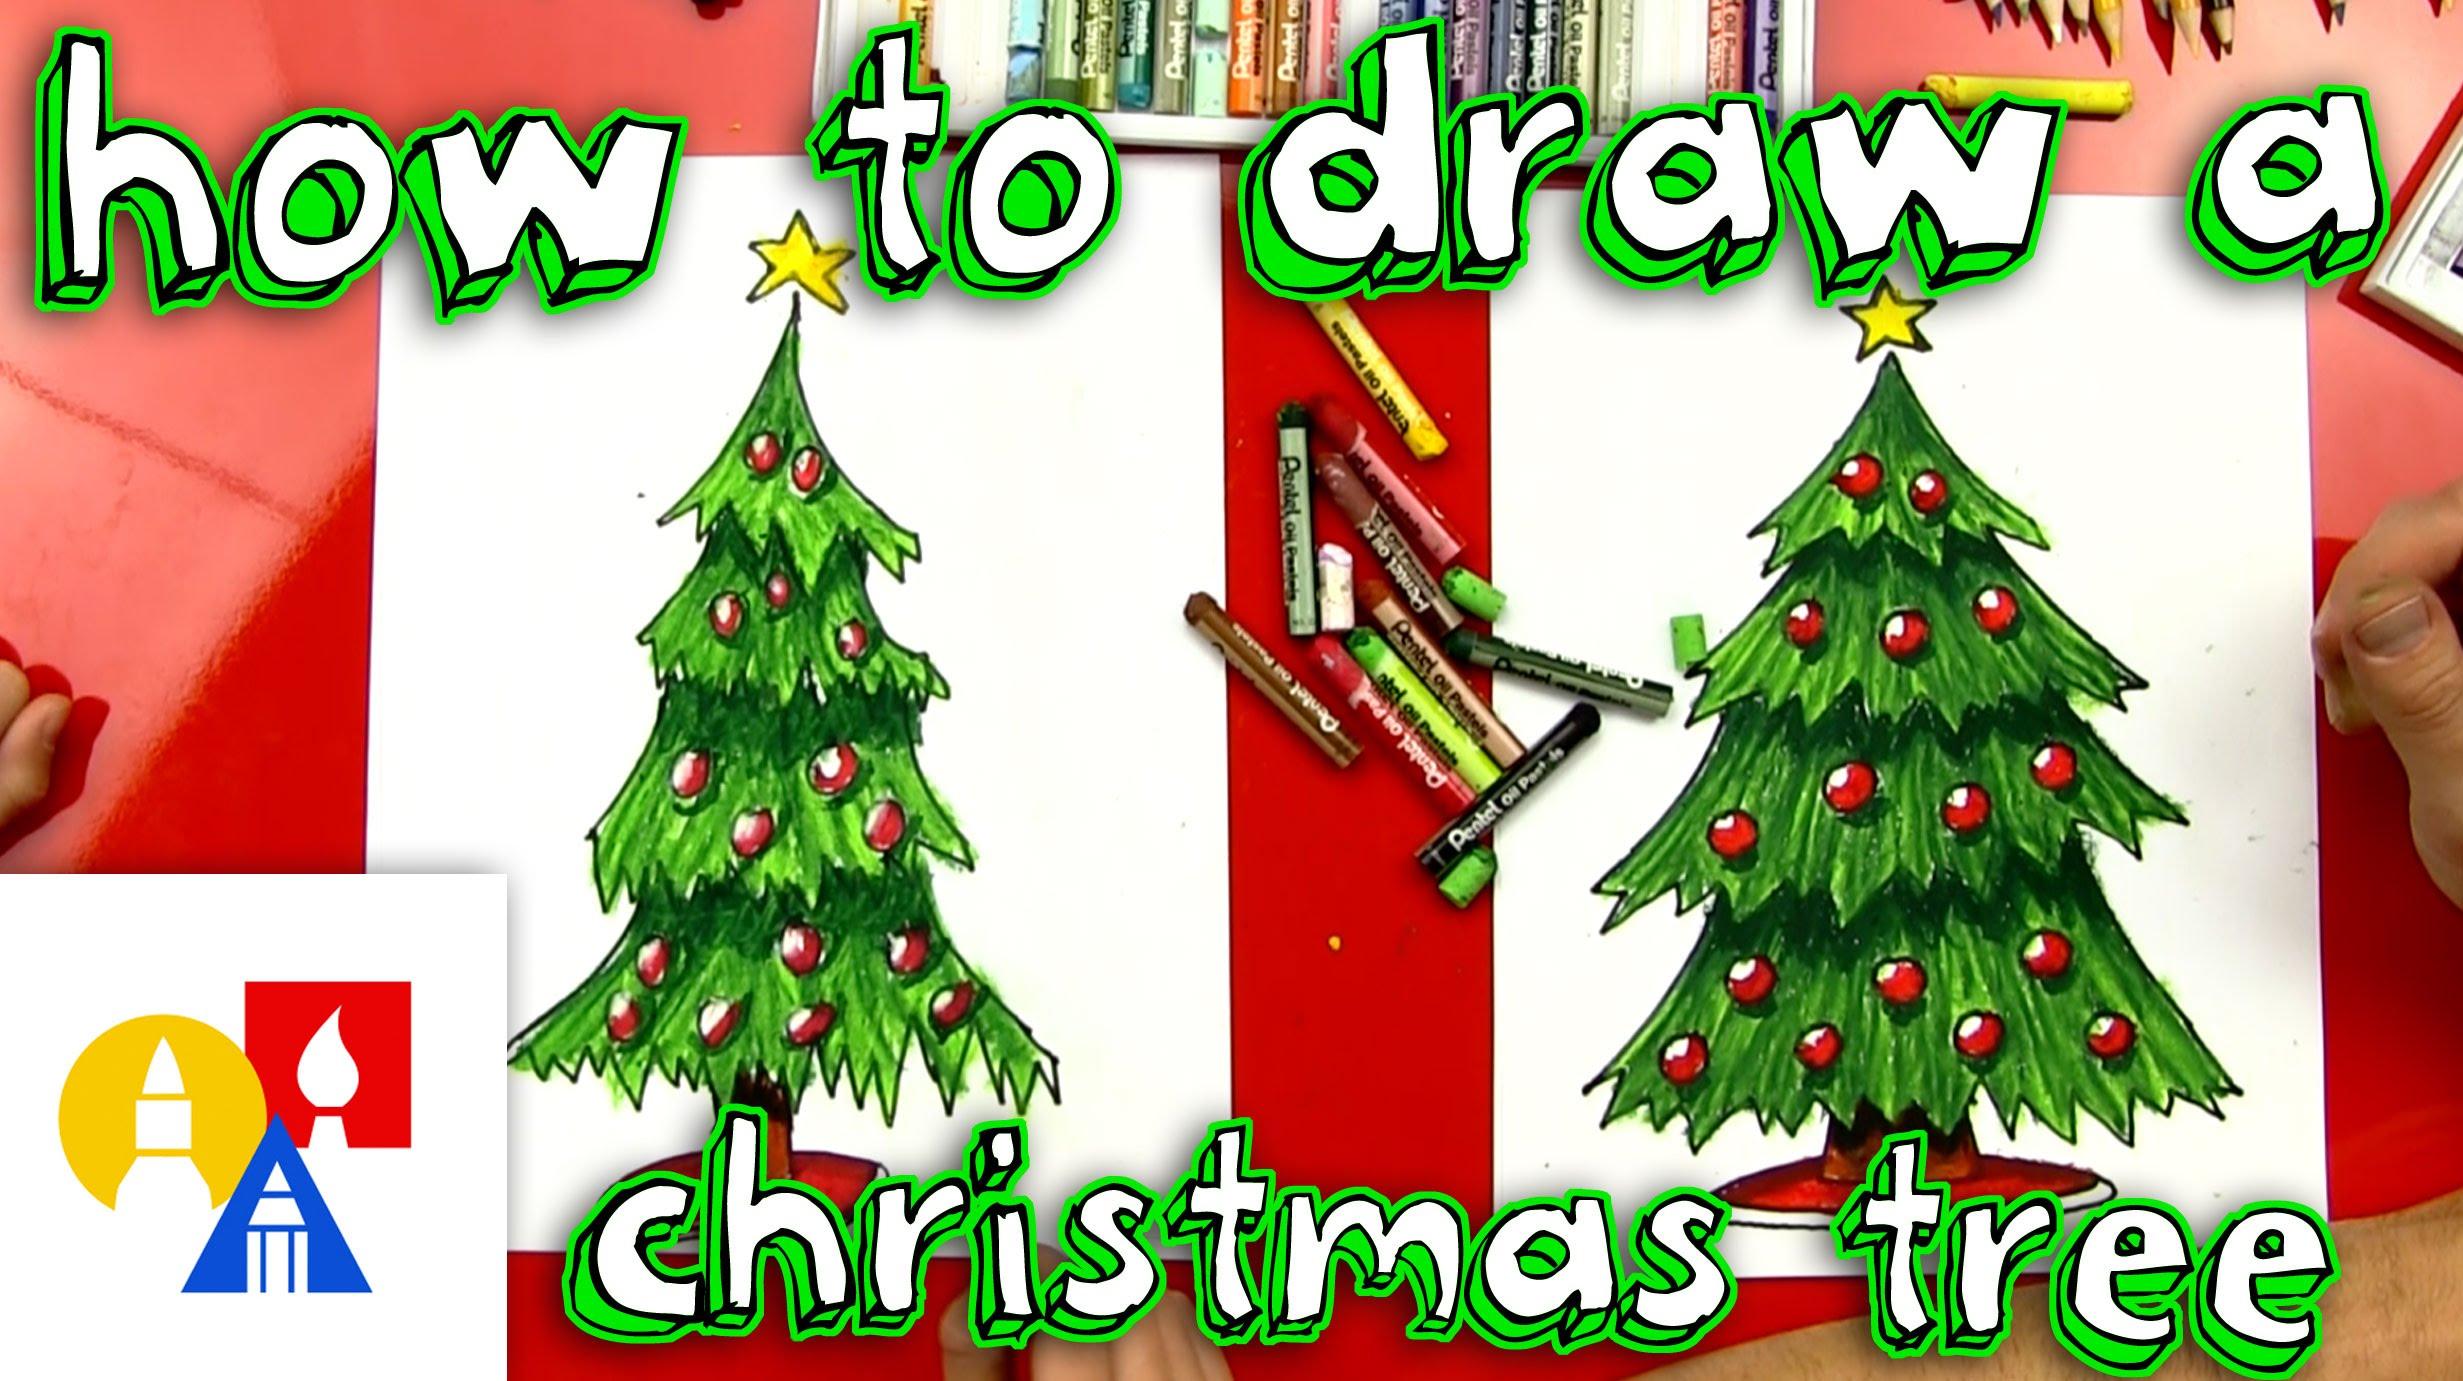 Drawn christmas ornaments childrens Christmas Tree How Draw Draw